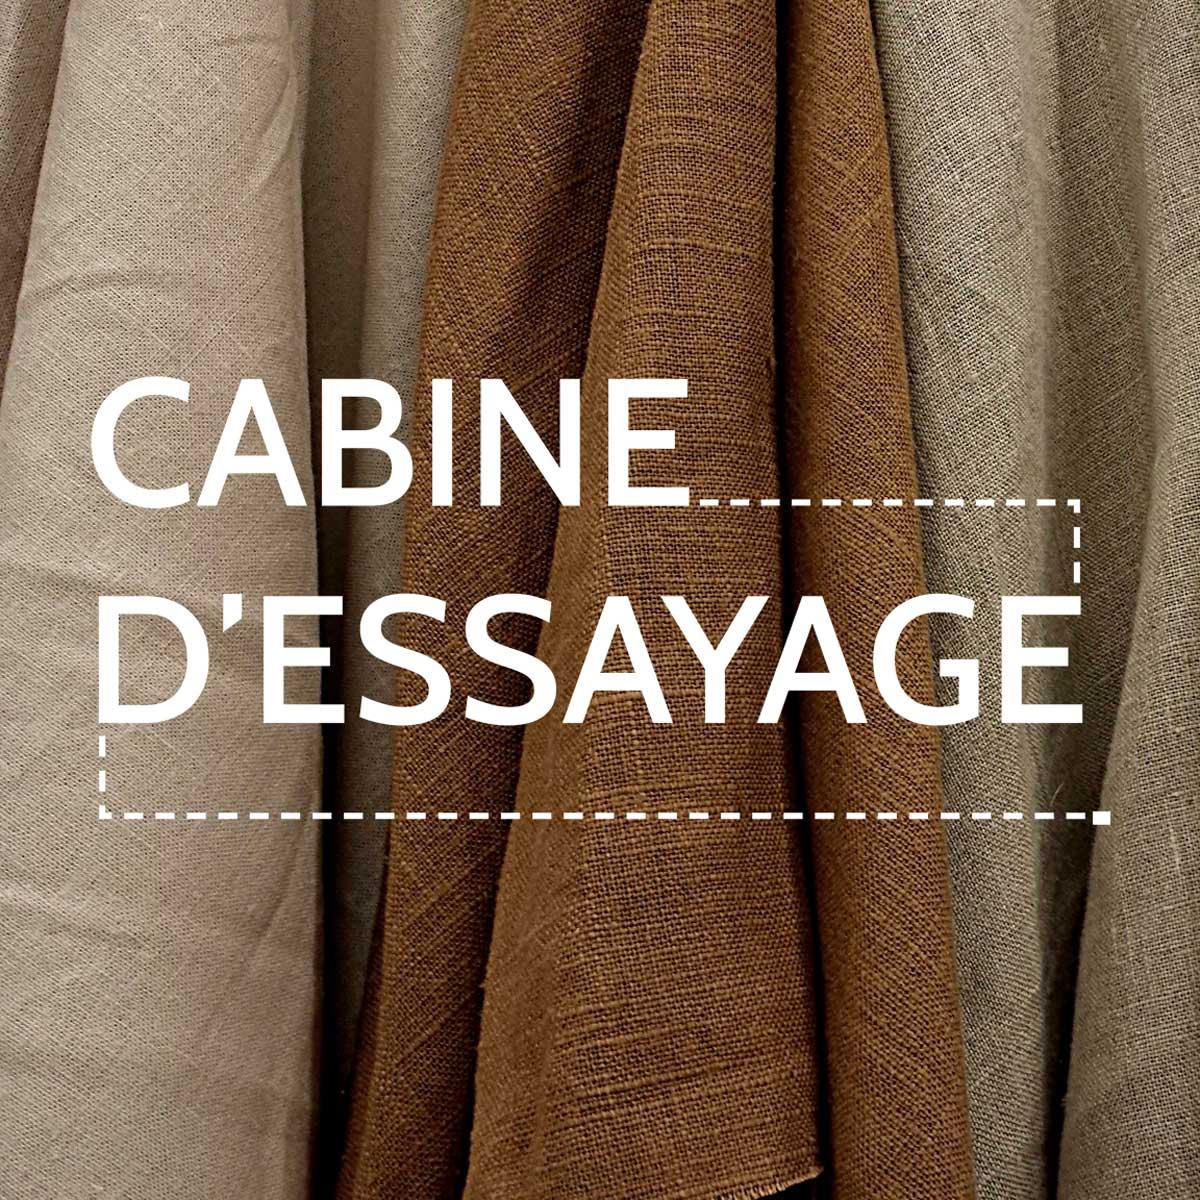 cabine-dessayage-logo-tissus